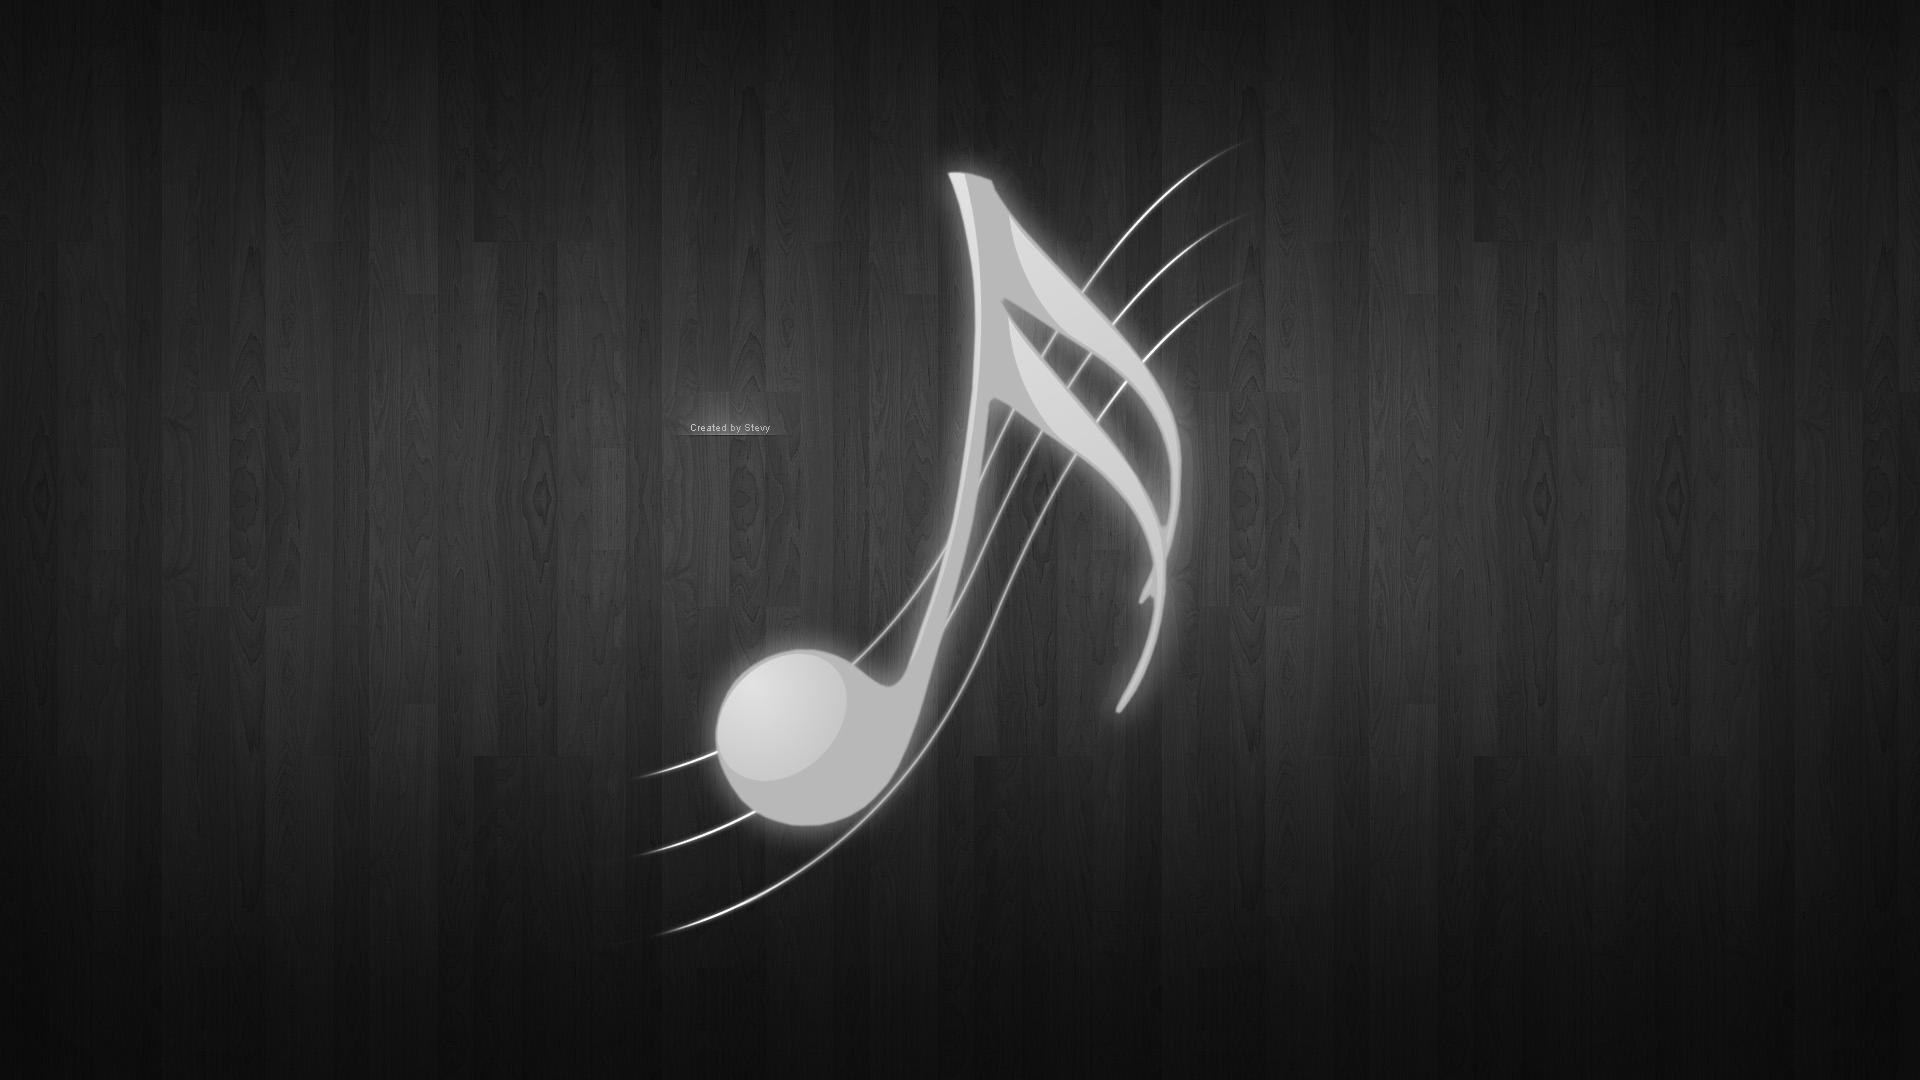 10 Best House Music Dj Wallpaper Full Hd 1080p For Pc: Wallpaper De Musica HD [Mega Post]